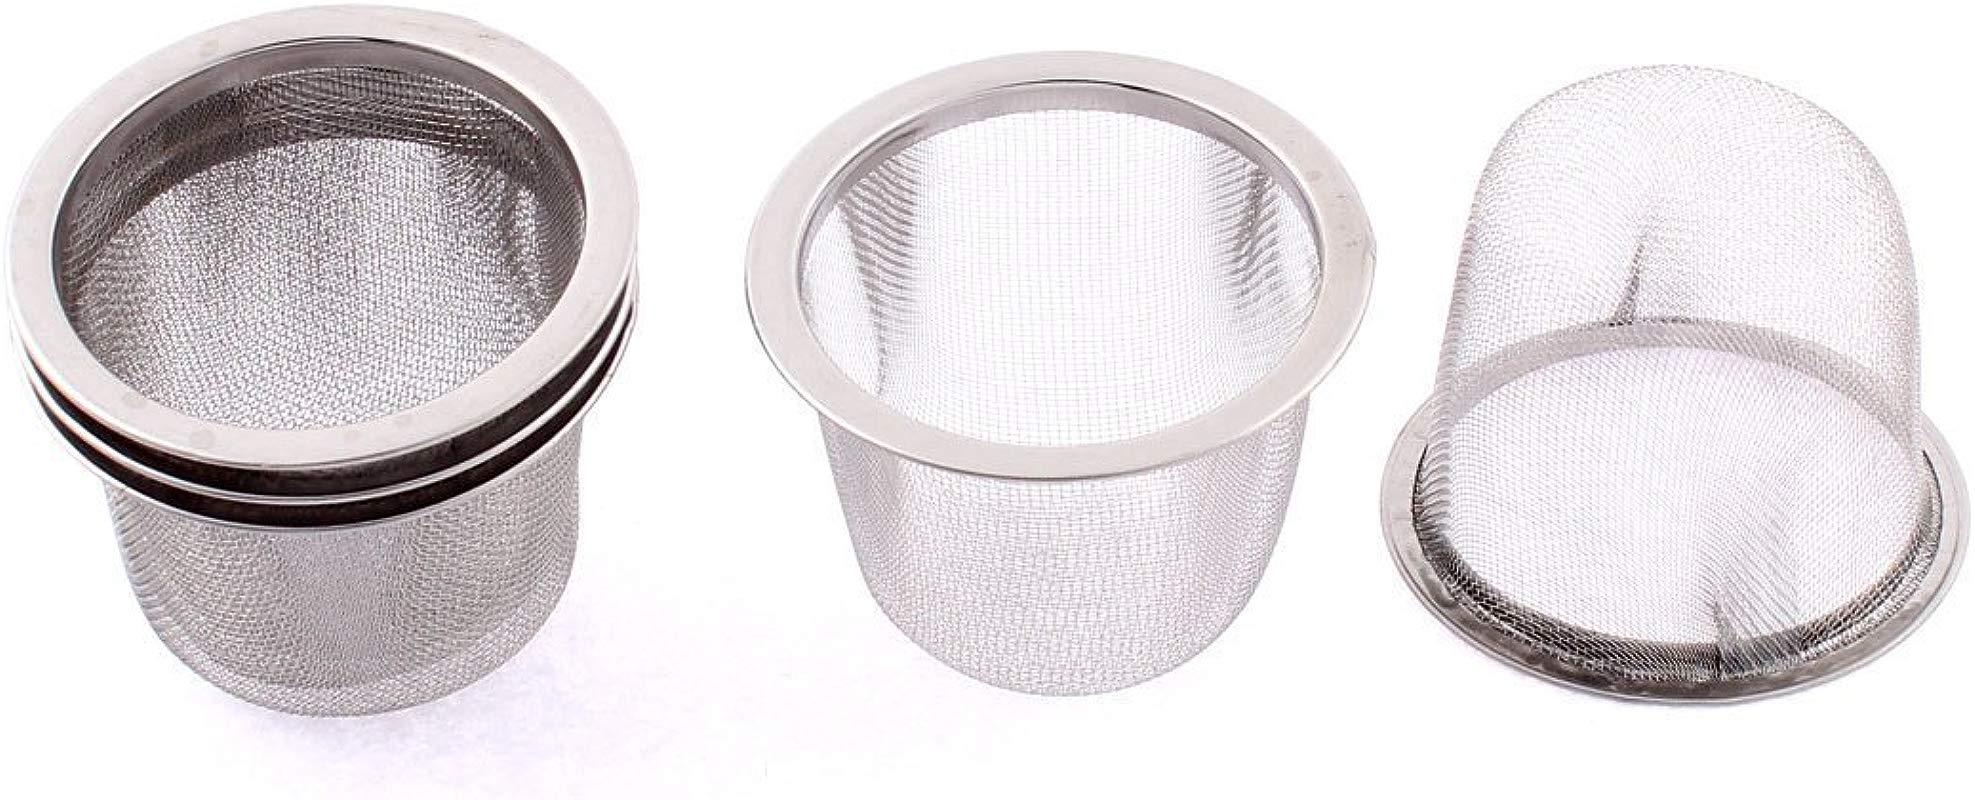 Xigeapg Stainless Steel Home Mesh Tea Infuser Strainer Basket 62mm Dia 5 Pcs